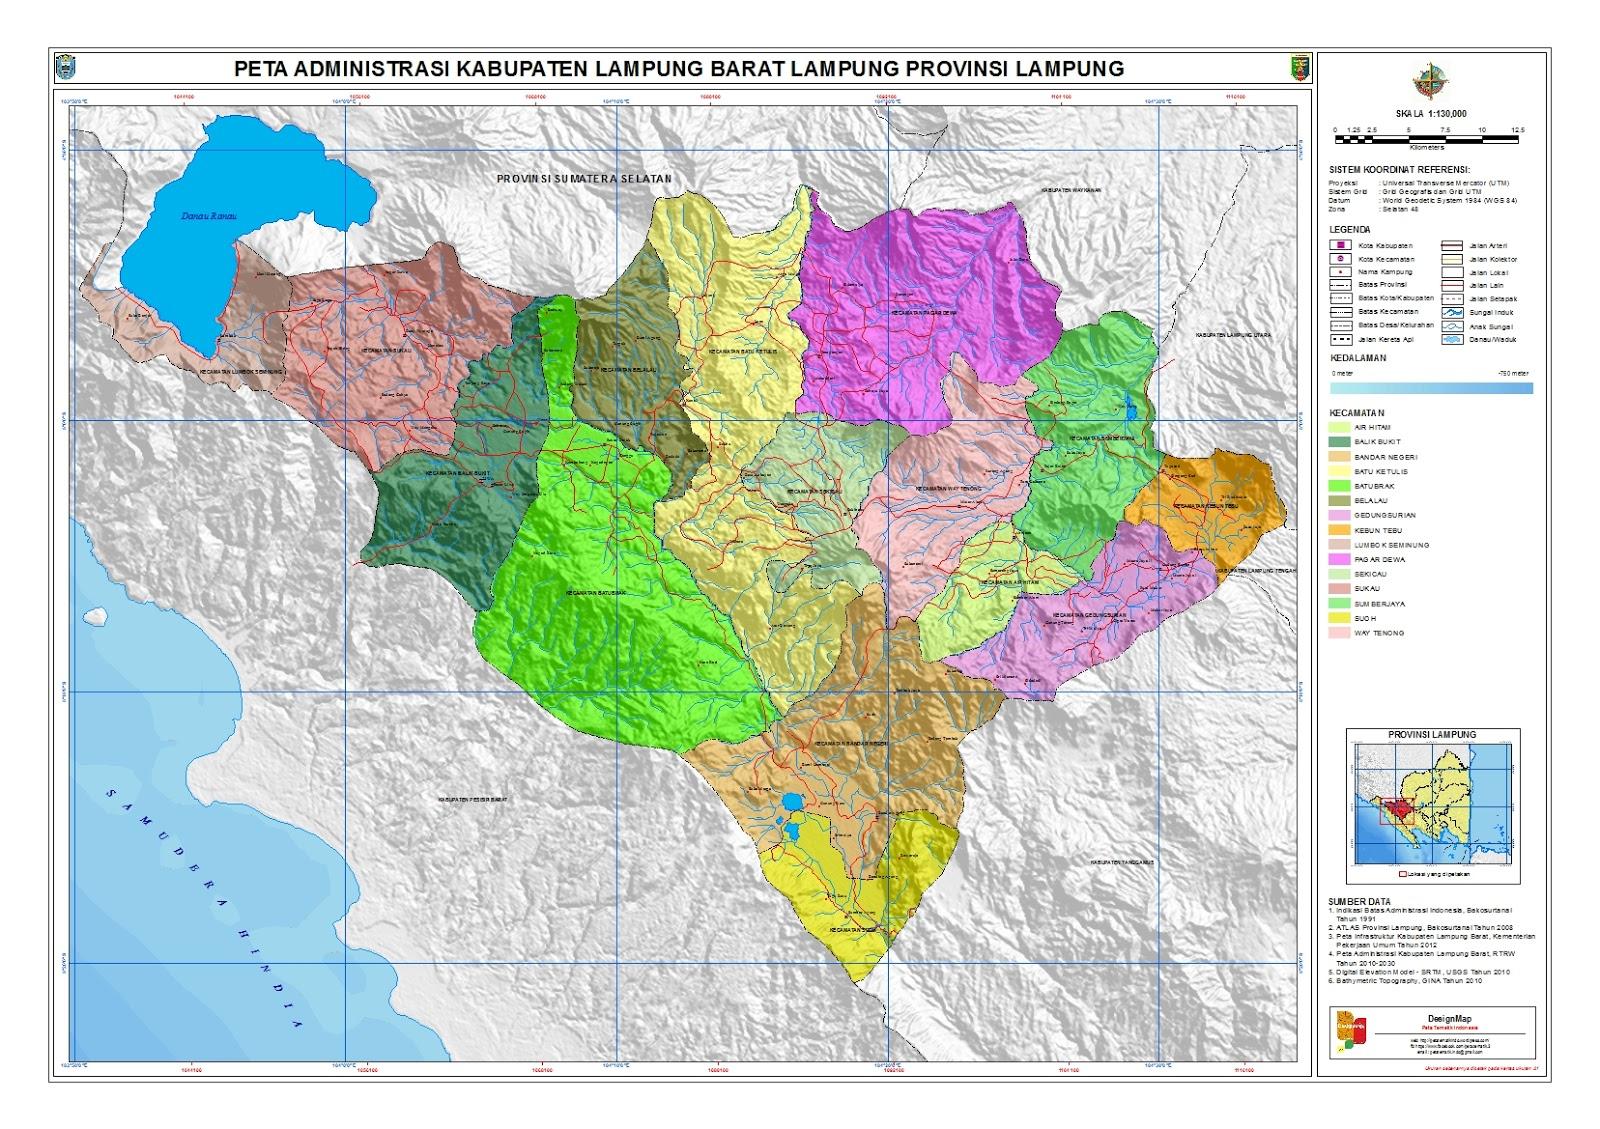 Luas Wilayah 15 Kecamatan di Lampung Barat